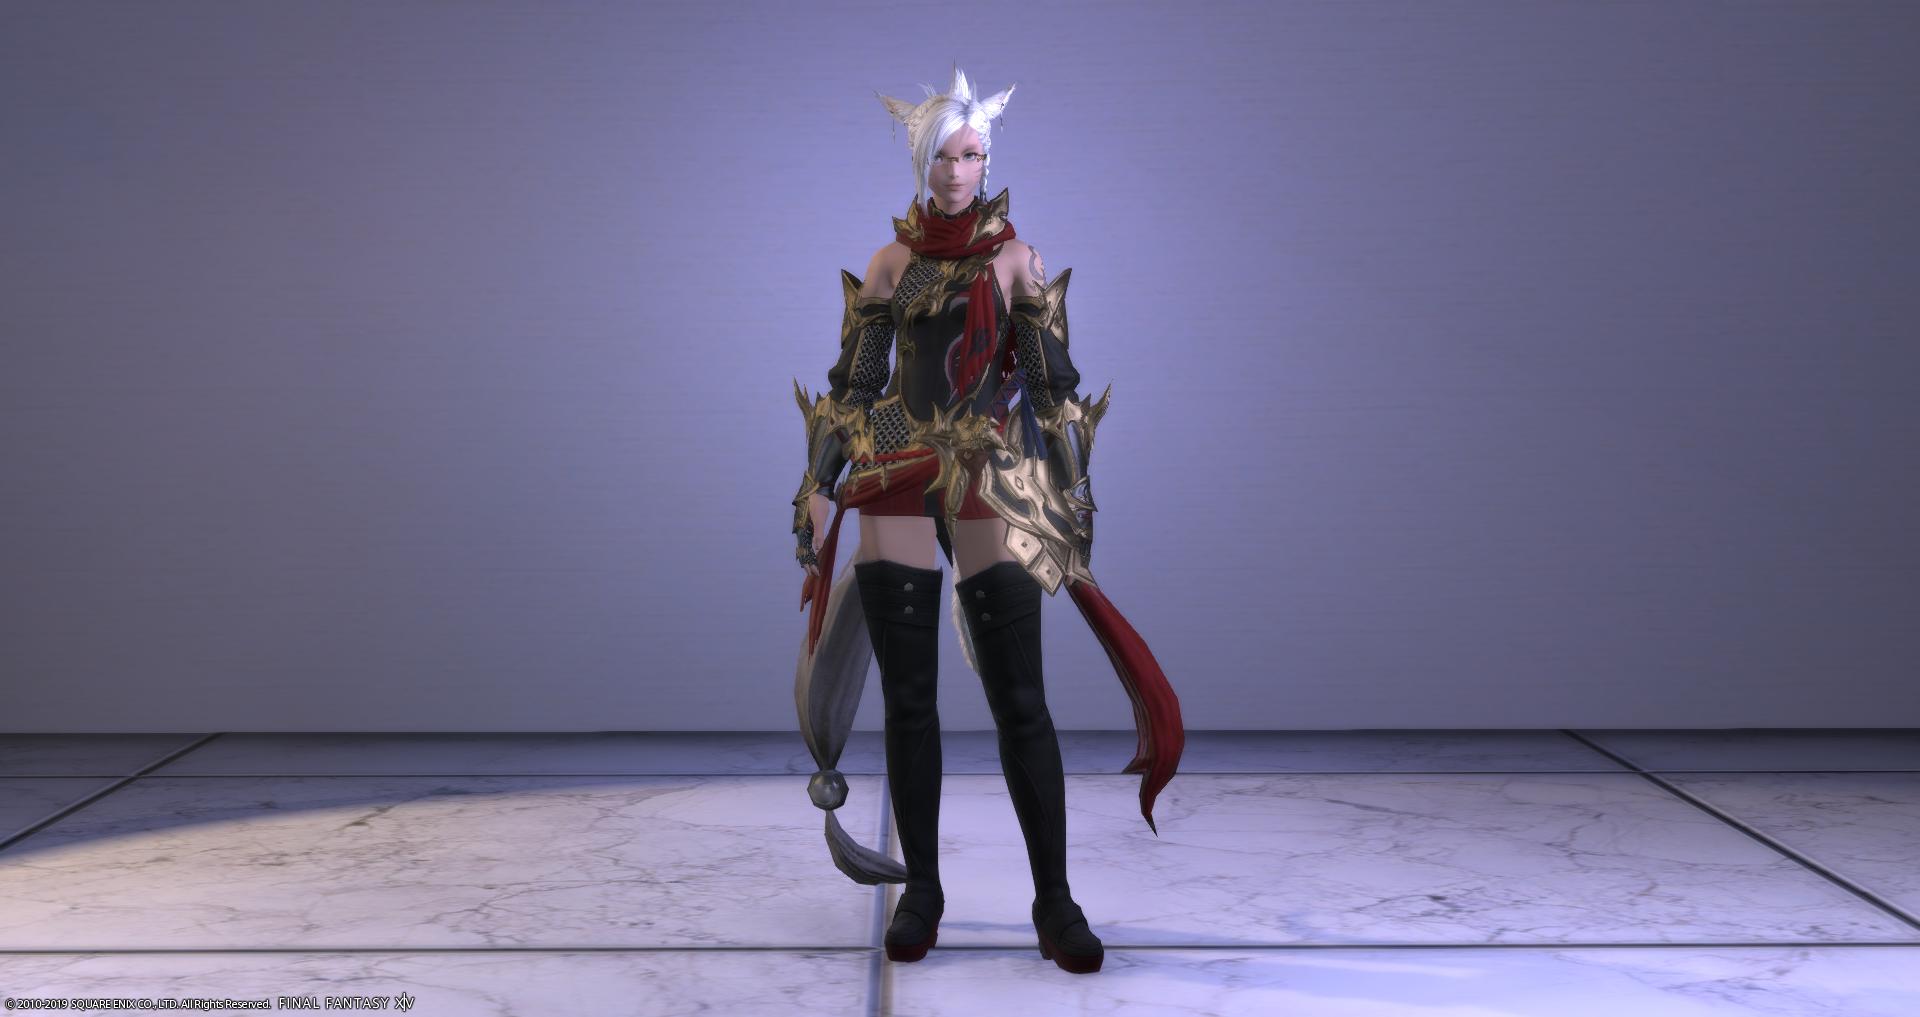 Glamour Spotlight: Ninja #14 | Alahra on Patreon